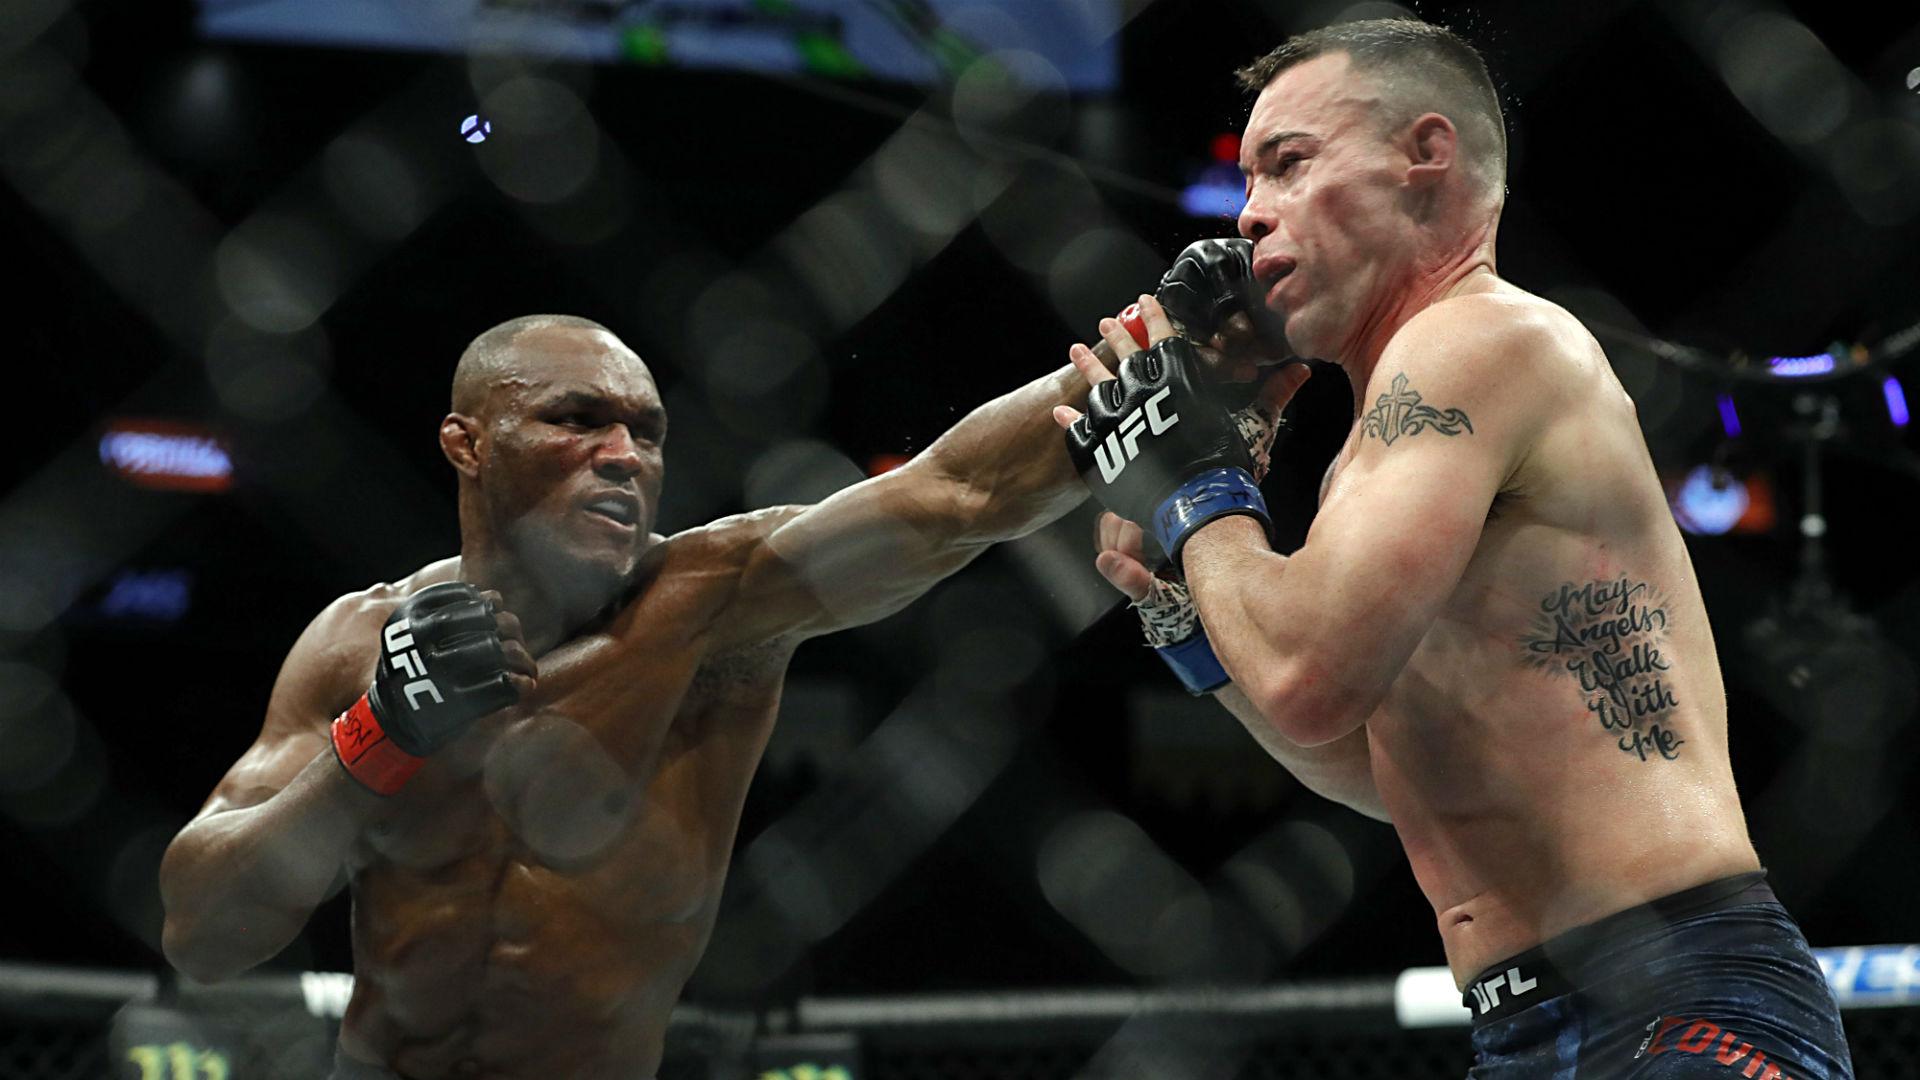 Colby Covington blasts 'fake stoppage' after UFC 245 defeat to Kamaru Usman